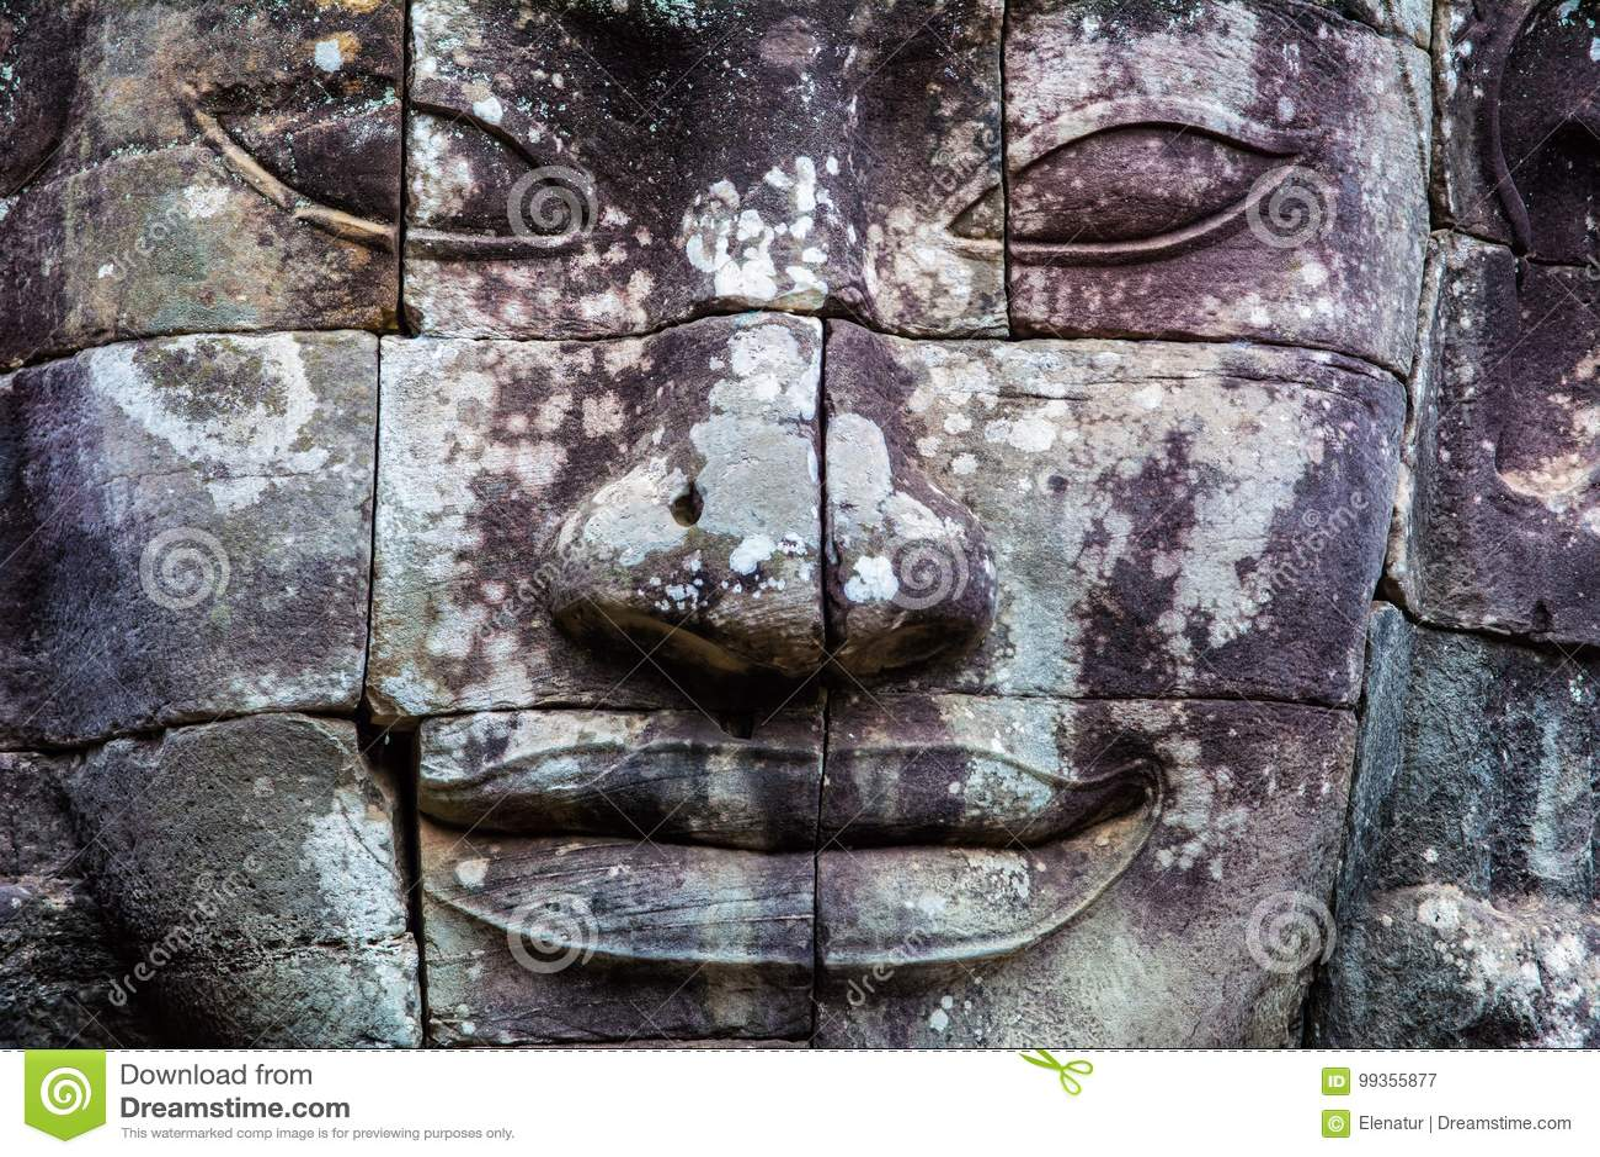 Peintures murales et temple en pierre Angkor Thom de Bayon de statue Angkor Vat